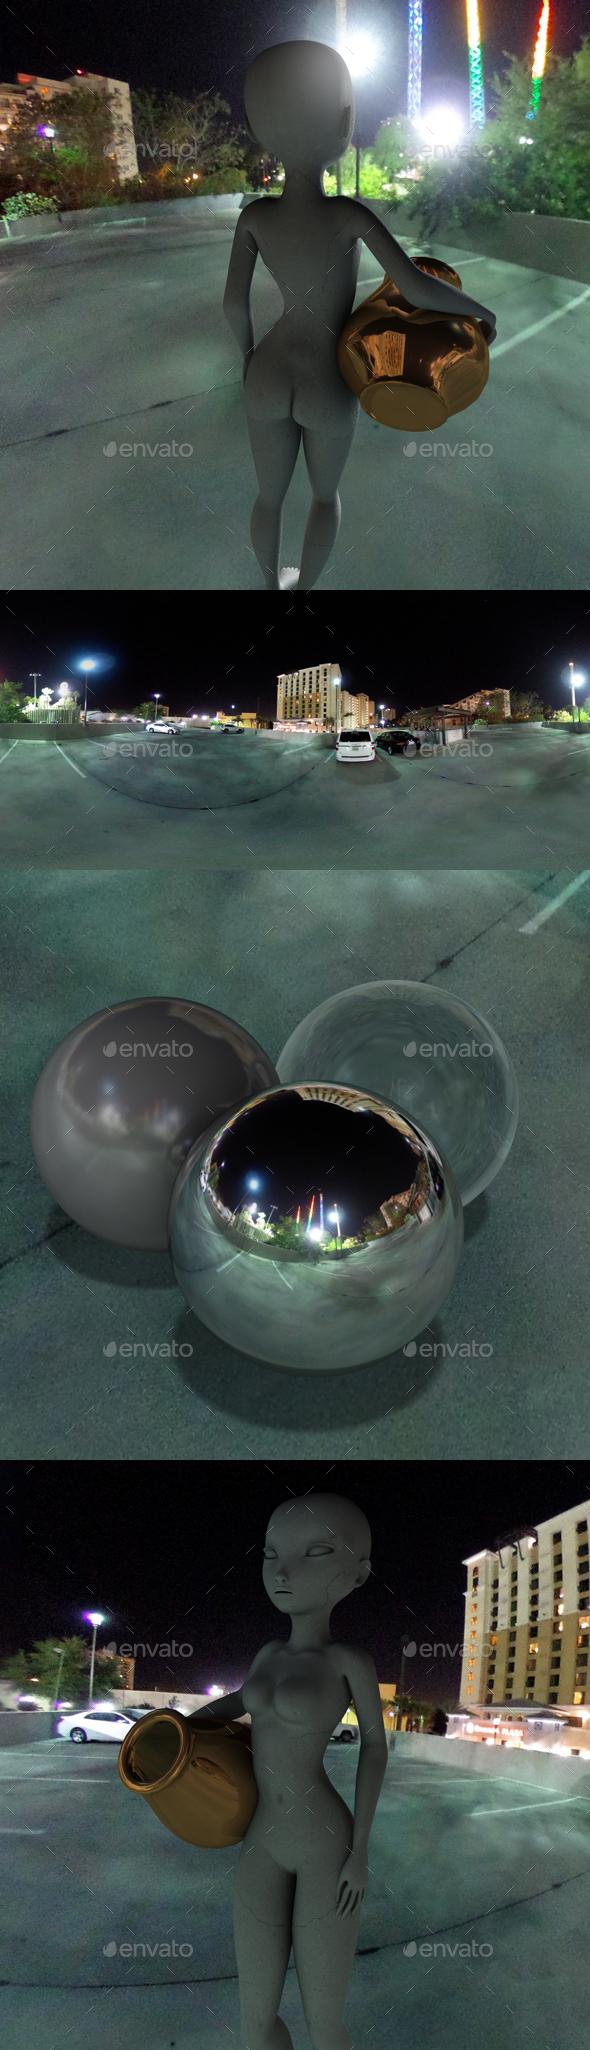 Nighttime Roof Car Park HDRI - 3DOcean Item for Sale